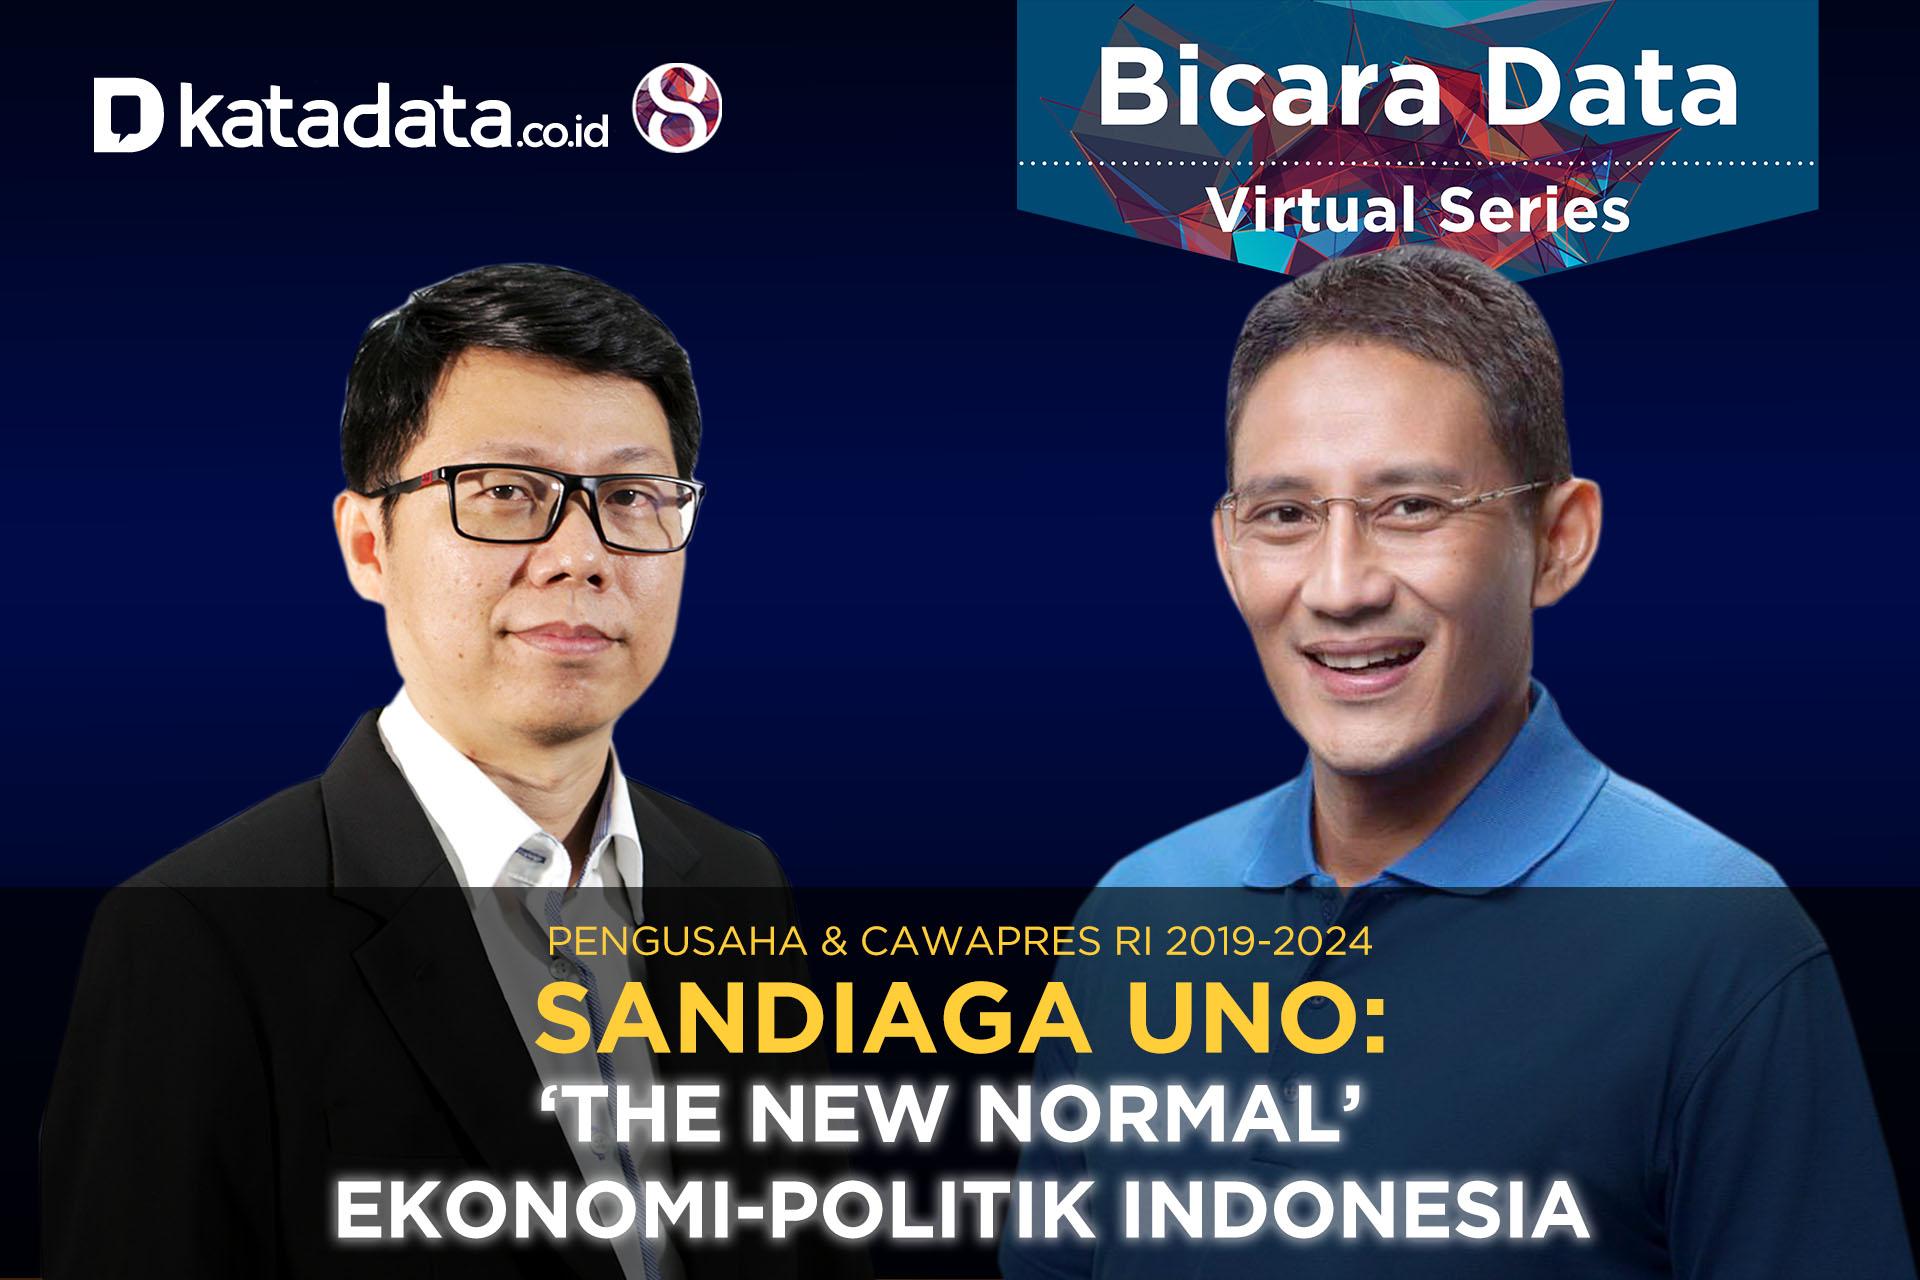 Bicara Data Sandiaga Uno: The New Normal Ekonomi-Politik Indonesia